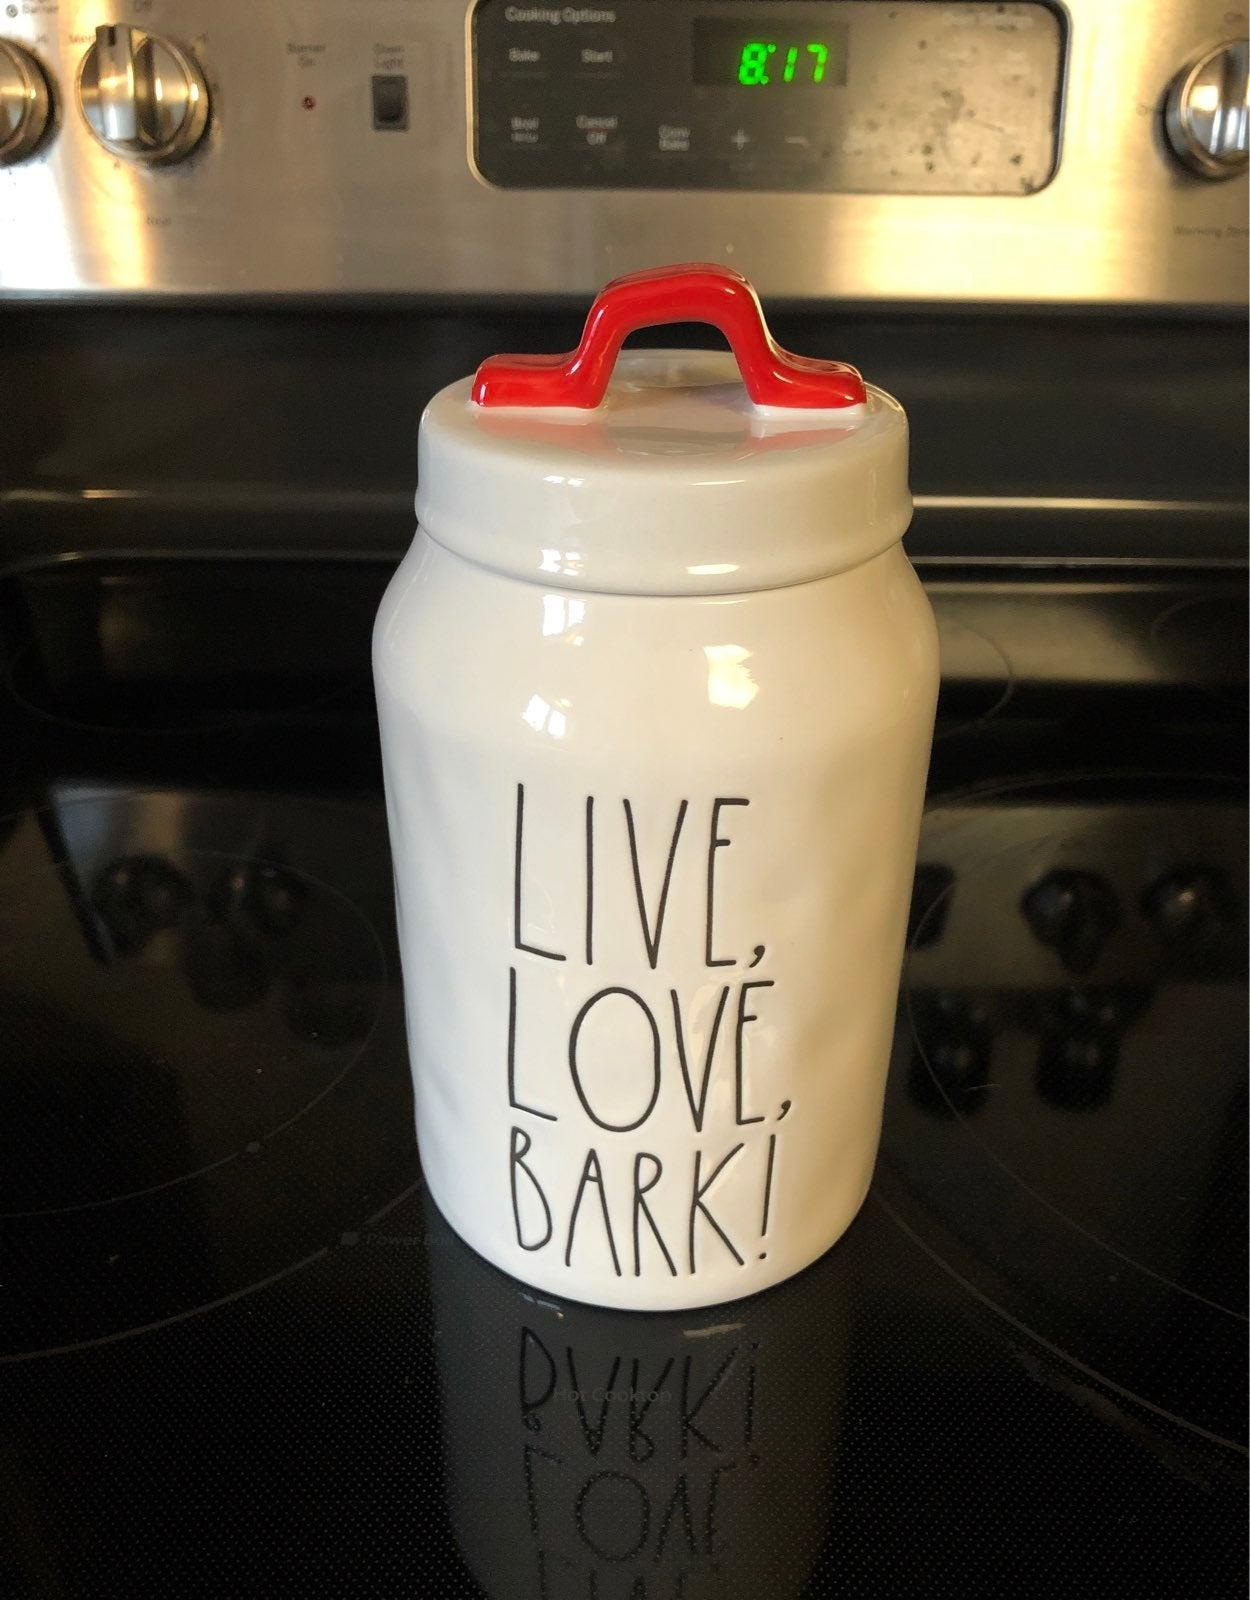 Rae Dunn Live, Love, Bark! Canister